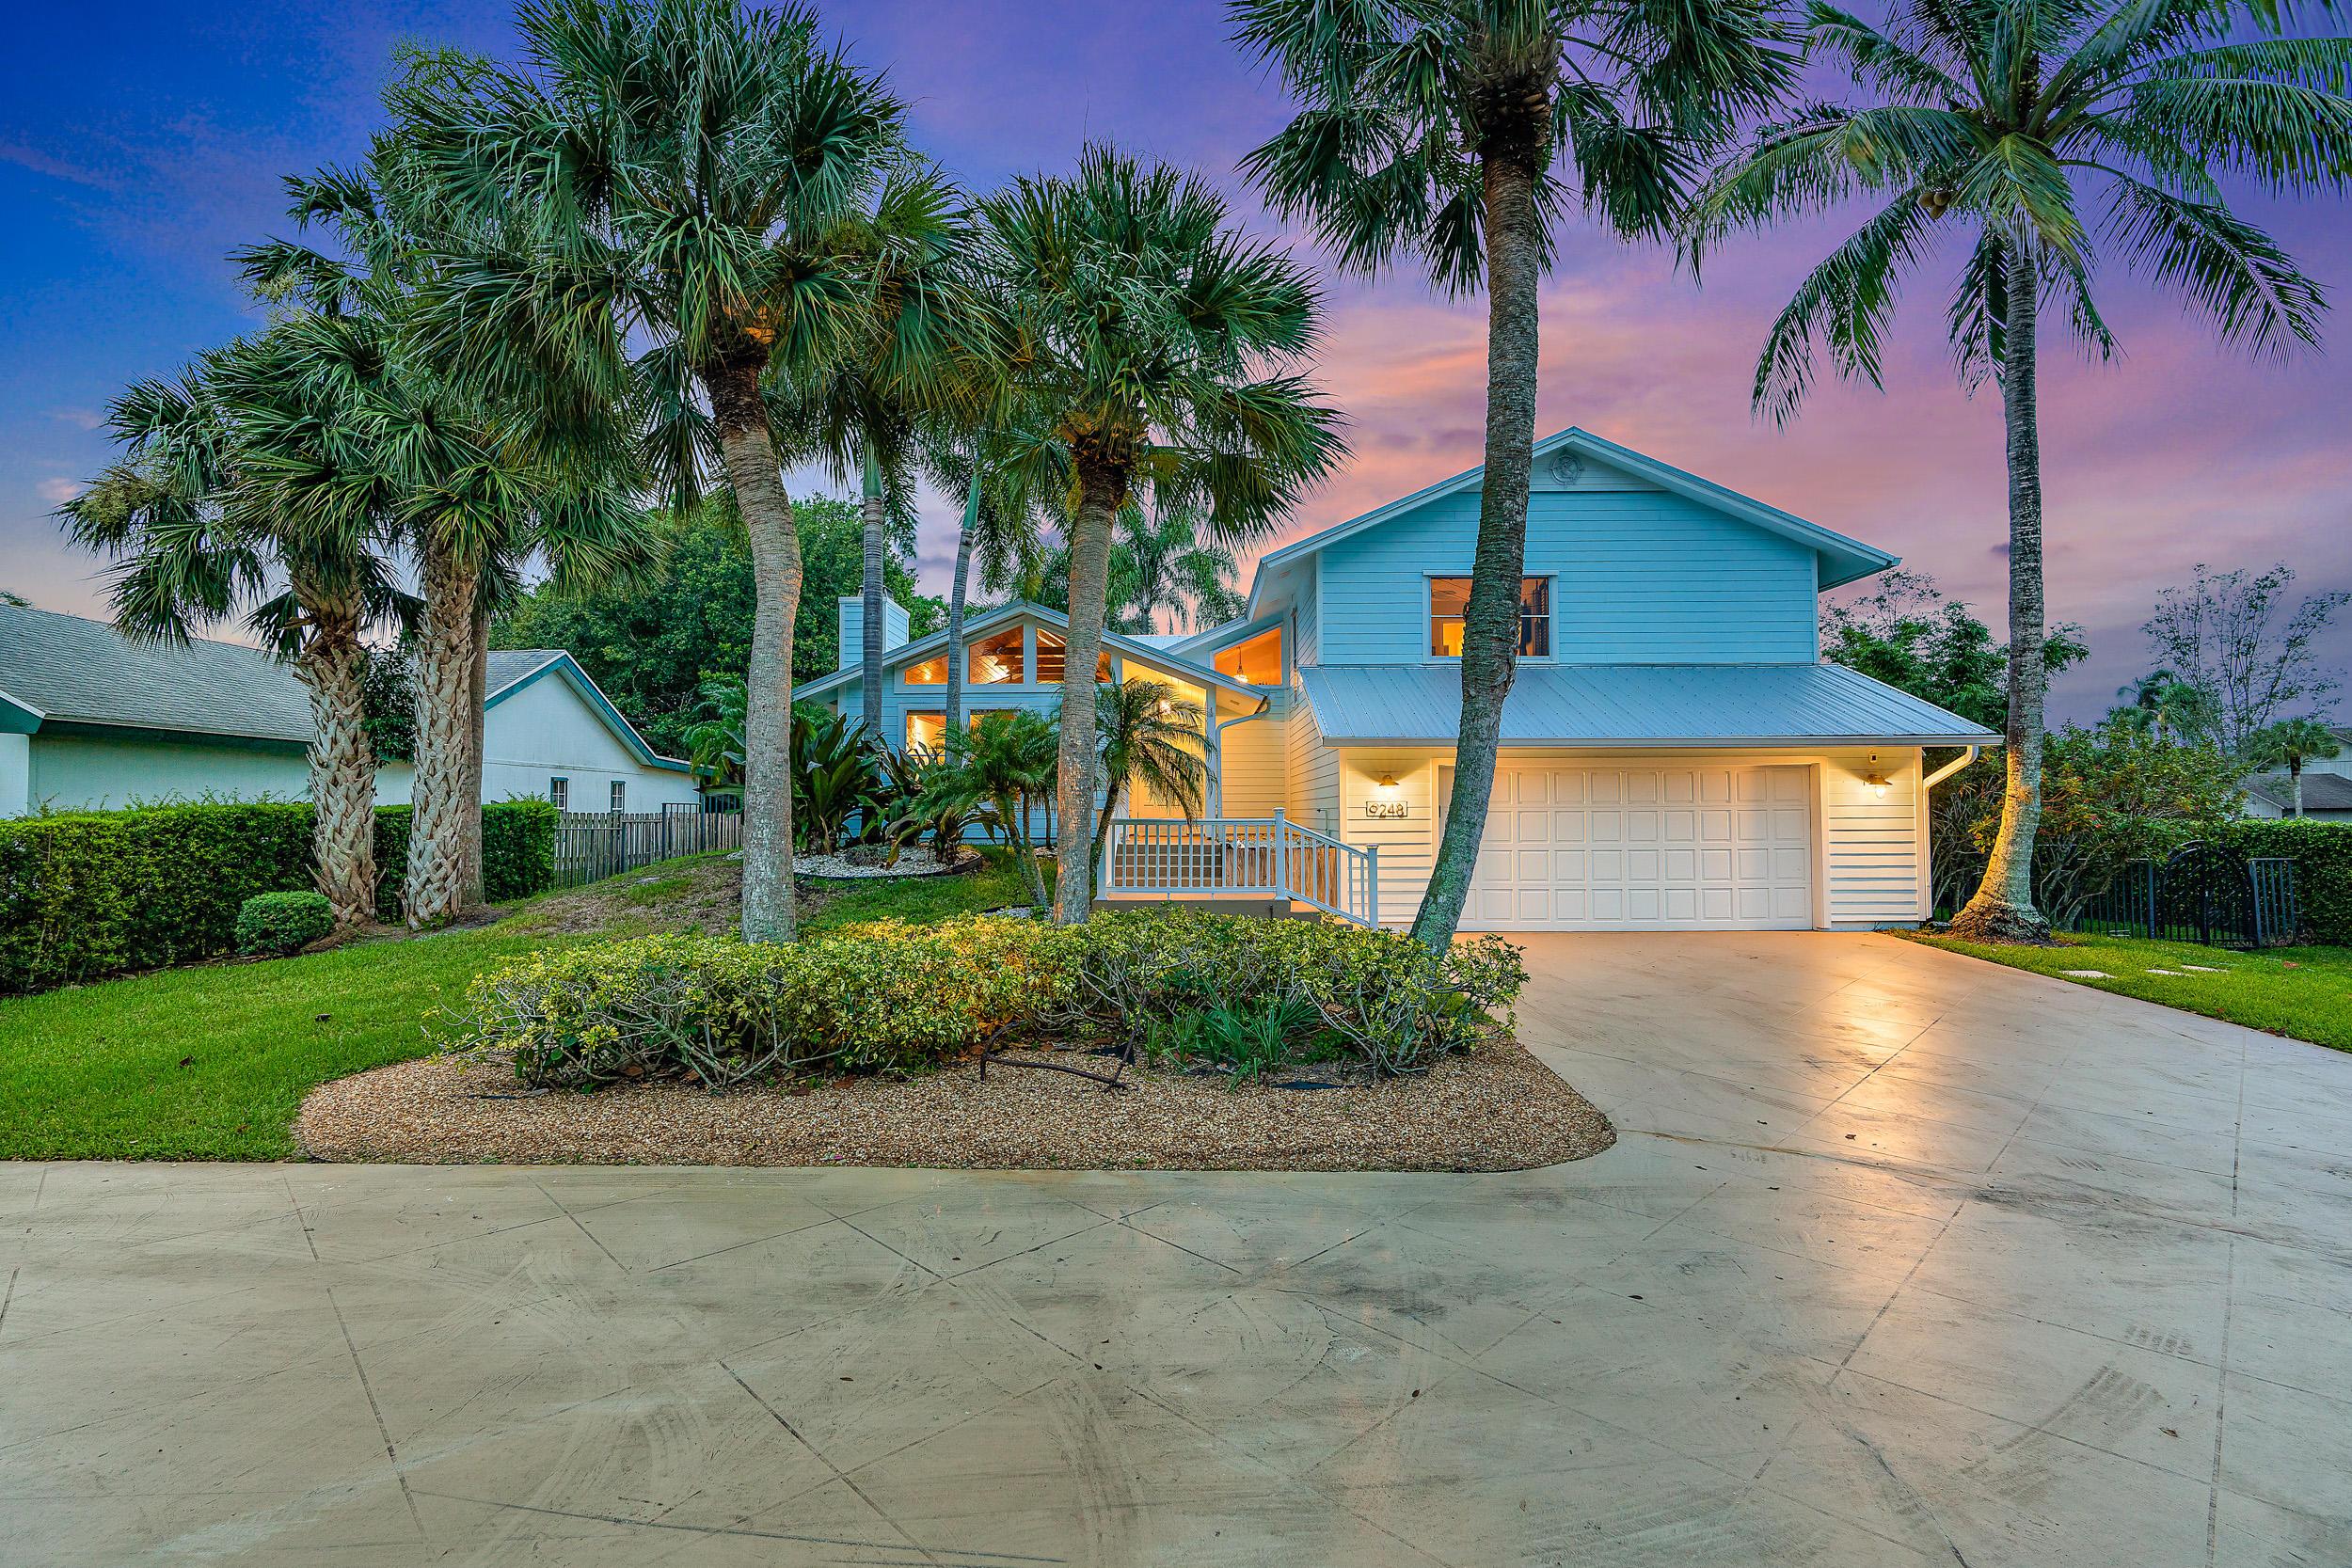 9248 Island, Tequesta, Florida 33469